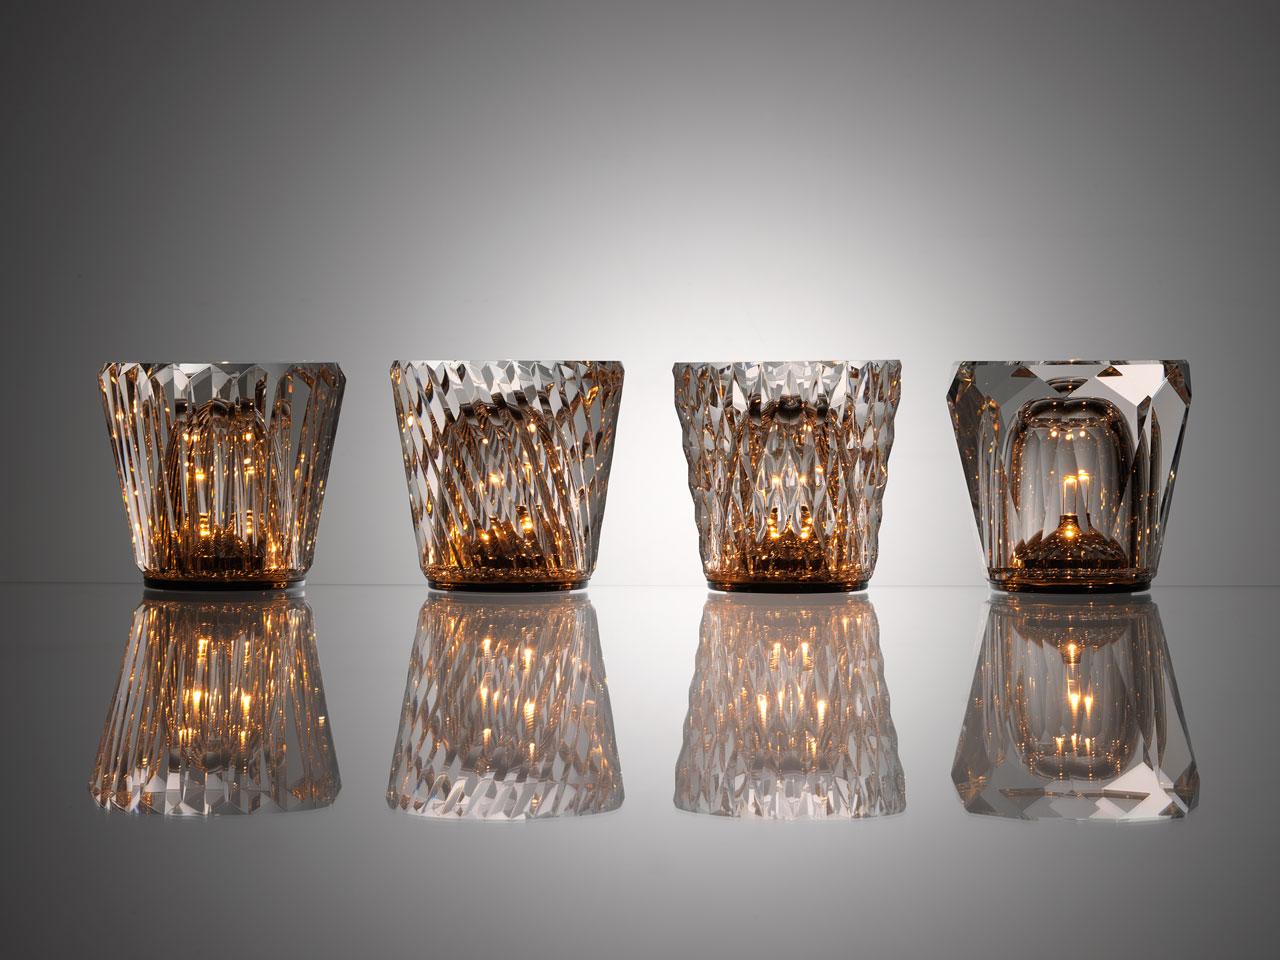 Cordless lamp seriesdesigned by Ryu Kozeki forAmbientec.